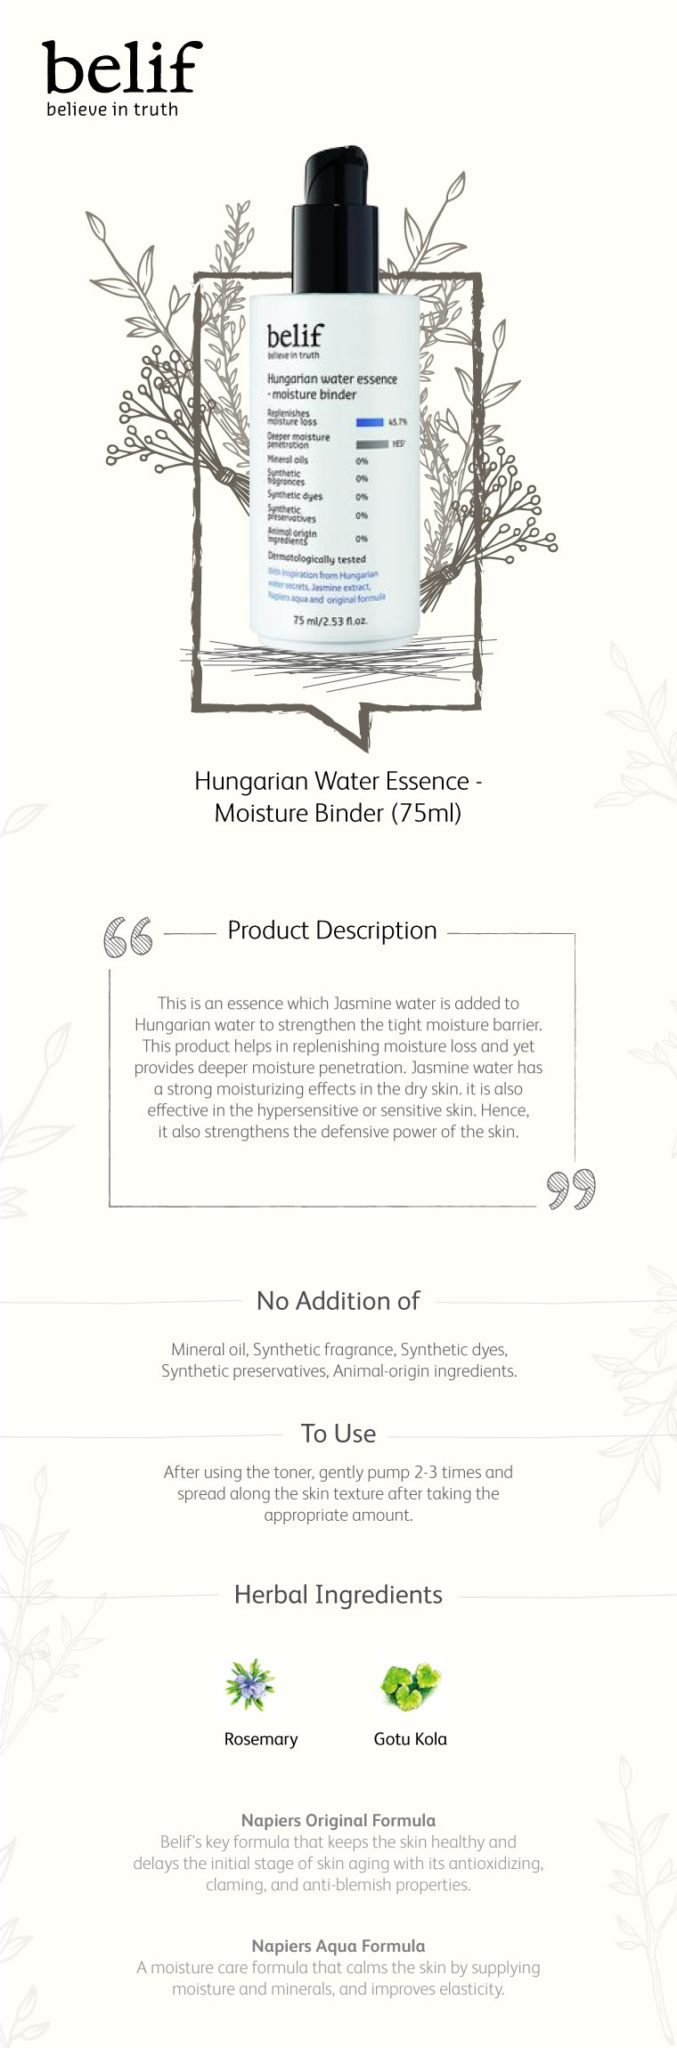 Belif Hungarian Water Essence - Moisture Binder 75ml